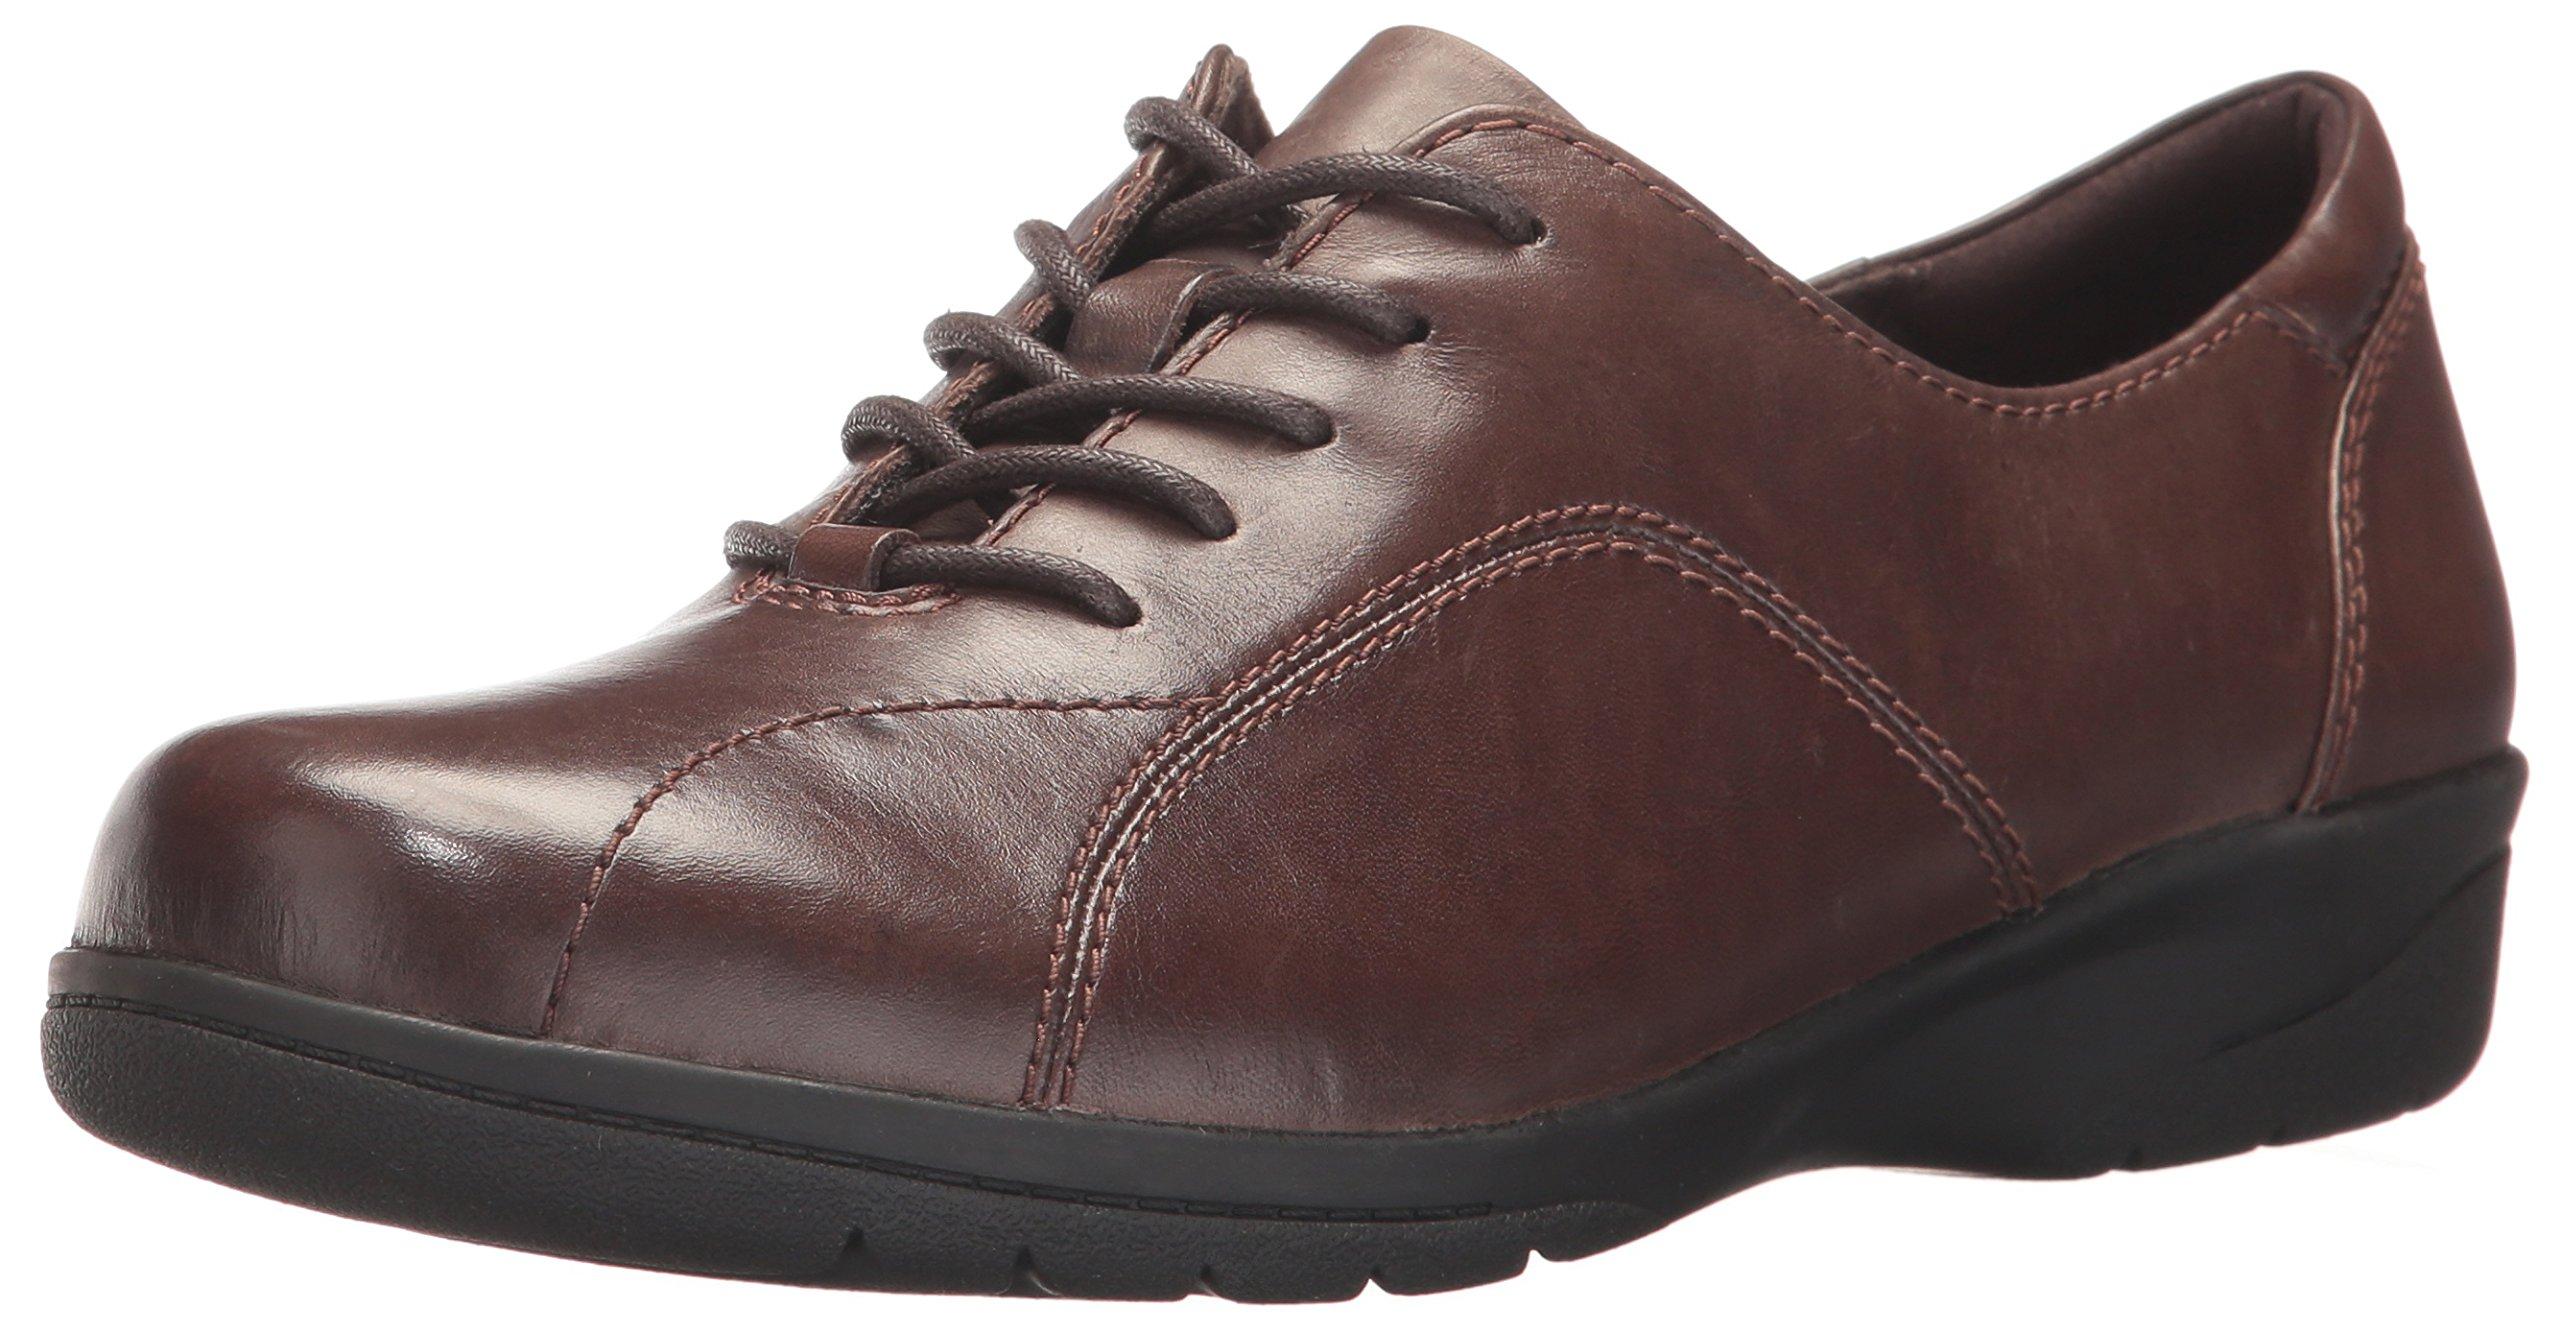 CLARKS Women's Cheyn Ava Oxford, Dark Brown Leather, 6.5 M US by CLARKS